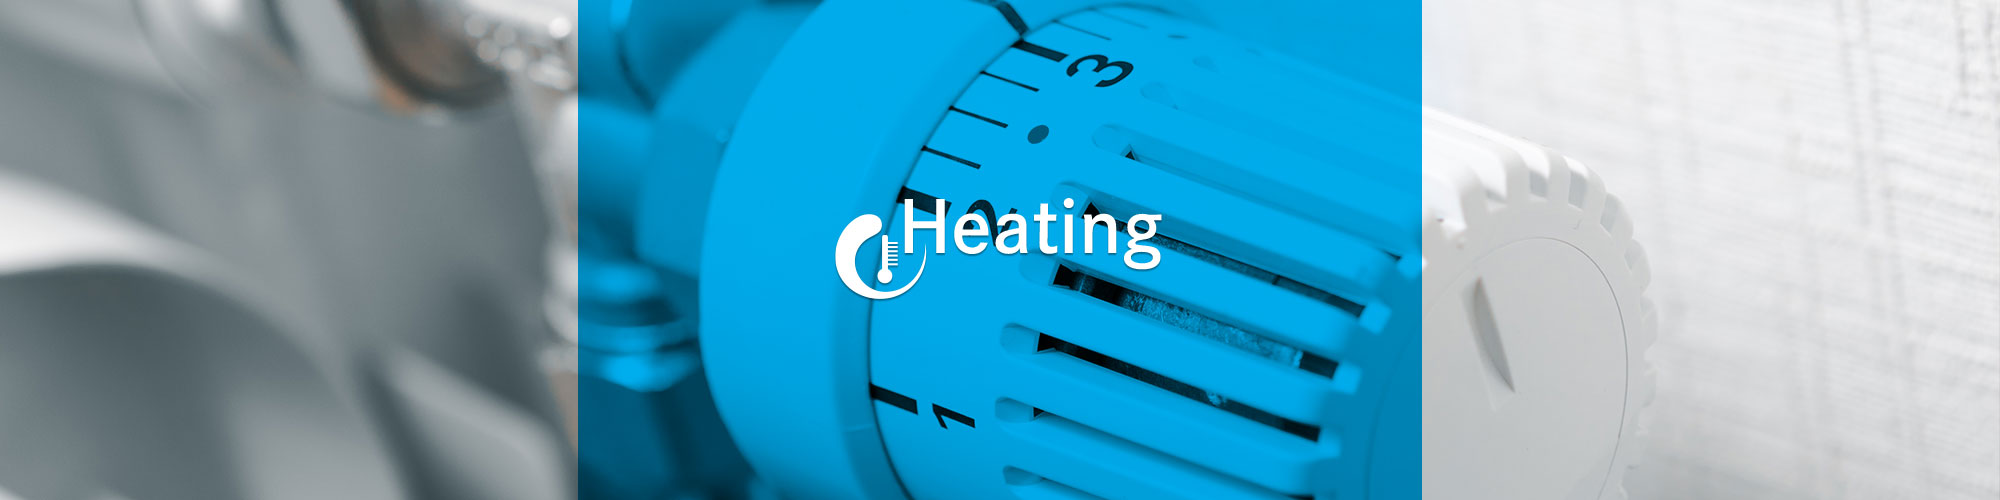 Ingeea Heating